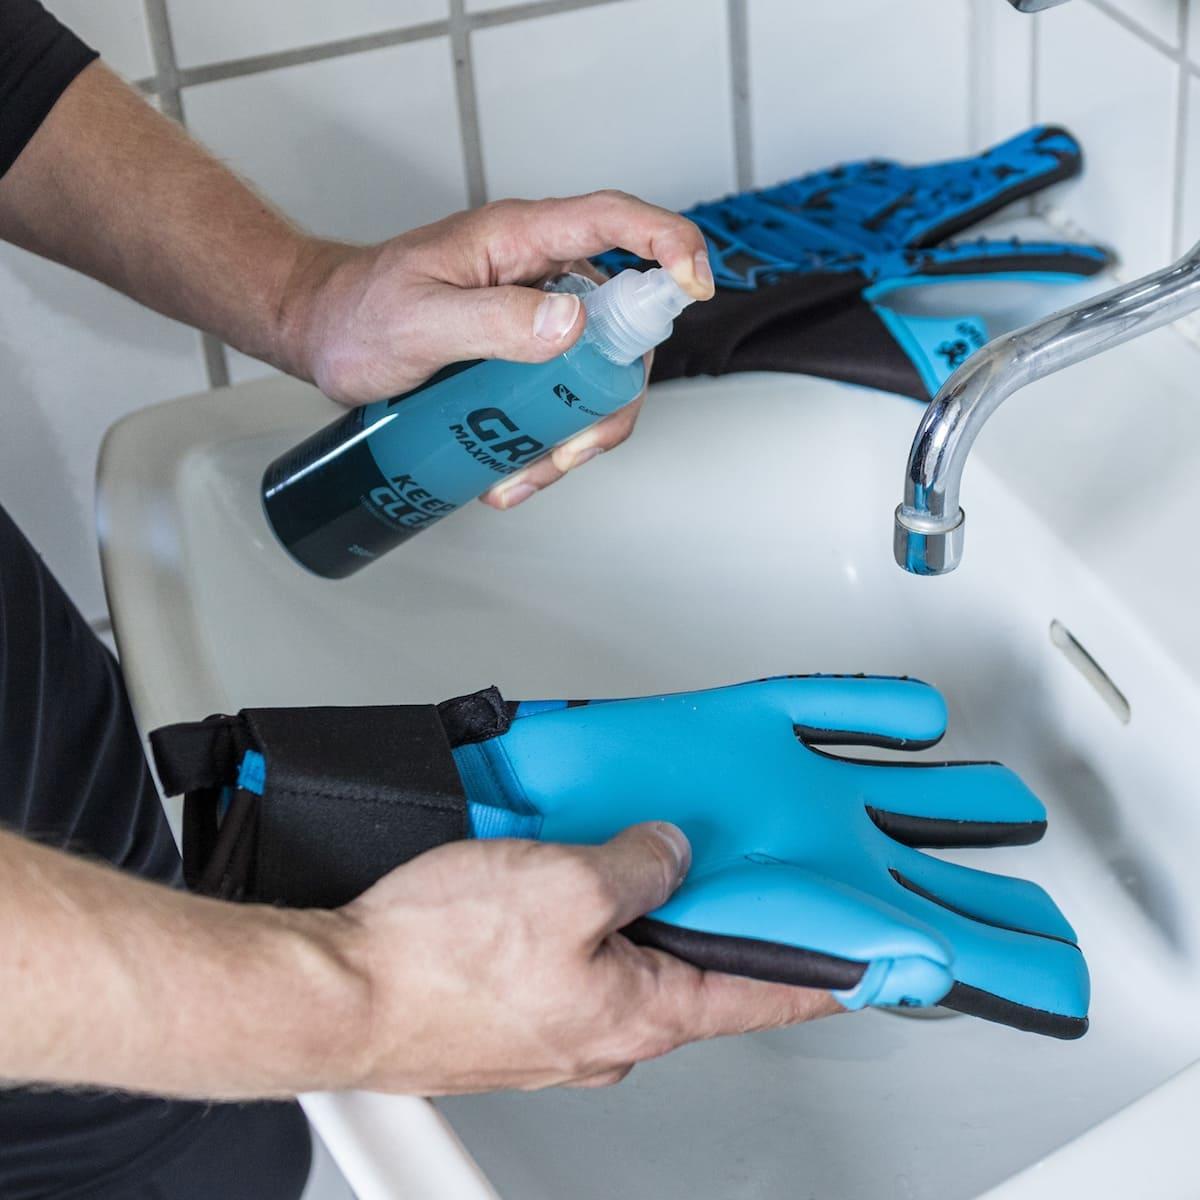 Grip Maximizer 2.0 catch and keep torwarthandschuhe grip spray Anwendung Spühlen